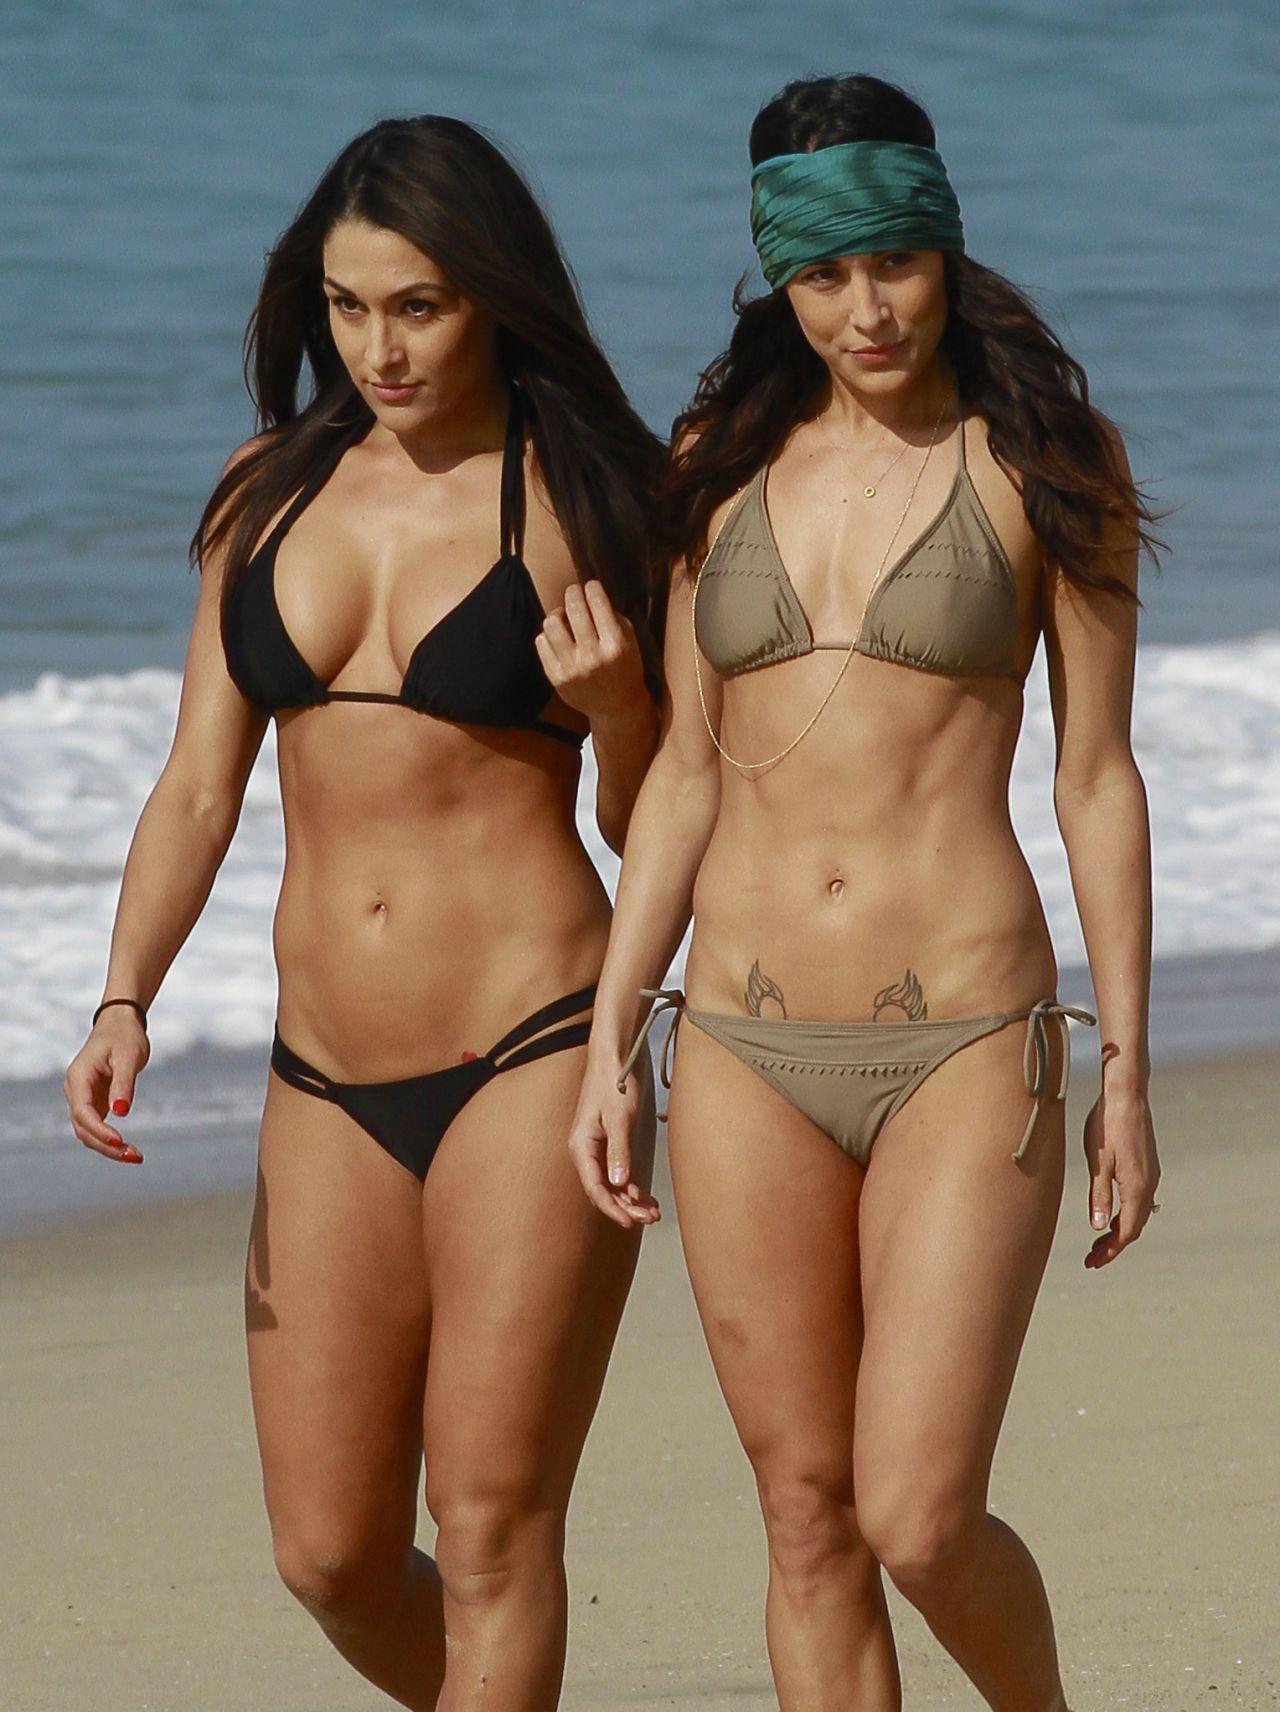 ��� Brie & Nikki Bella ��������� �� ��� ������ 2014